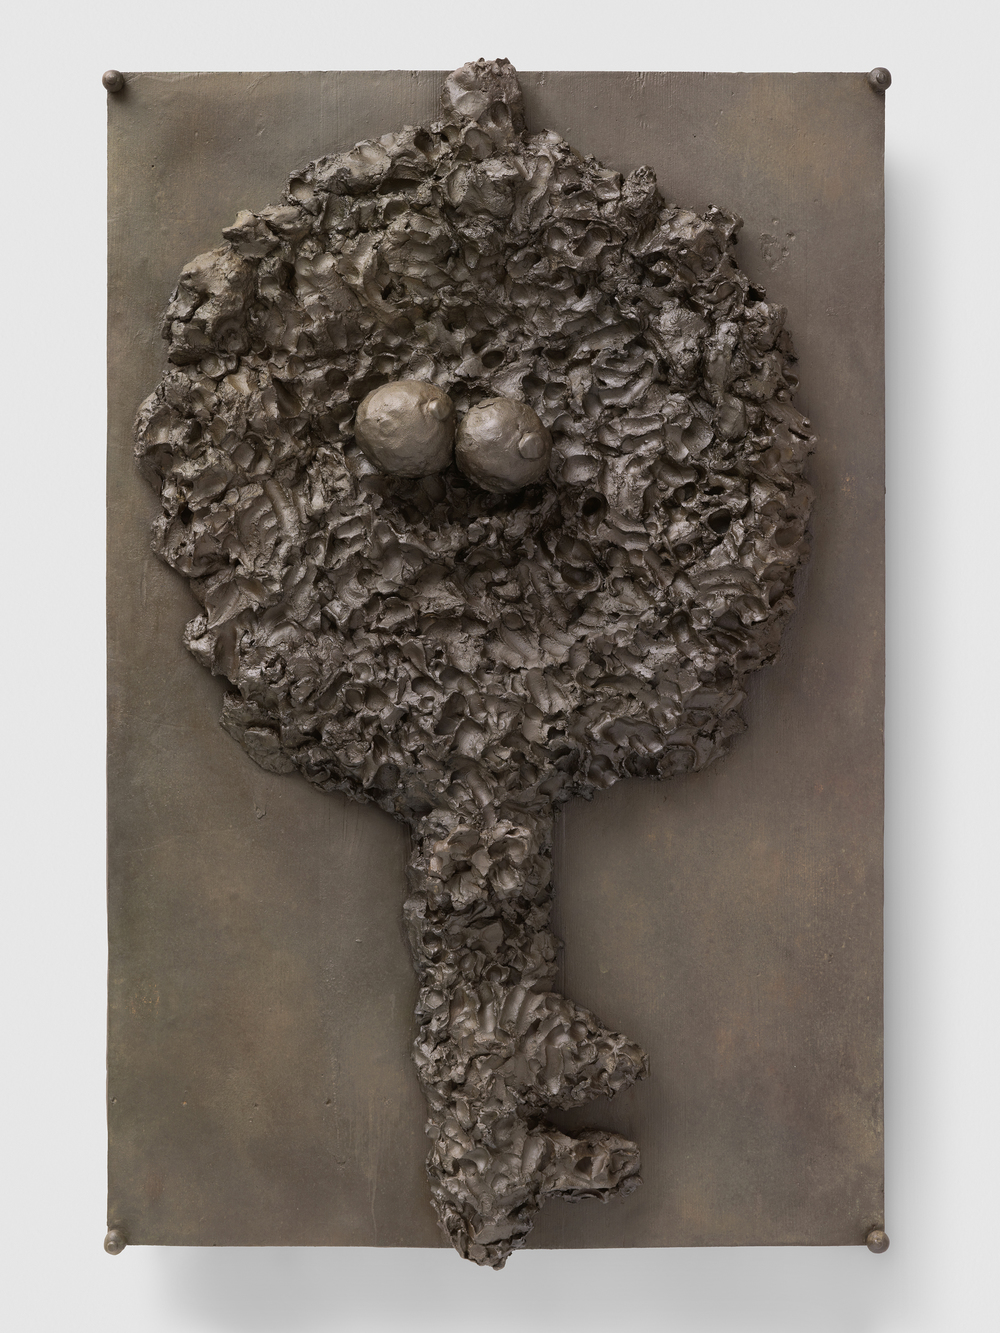 Armen Eloyan ' Key', 2016.Bronze,134 x 89 x 14 cm, ed. of 3 + 2AP.© Armen Eloyan,Courtesy Timothy Taylor